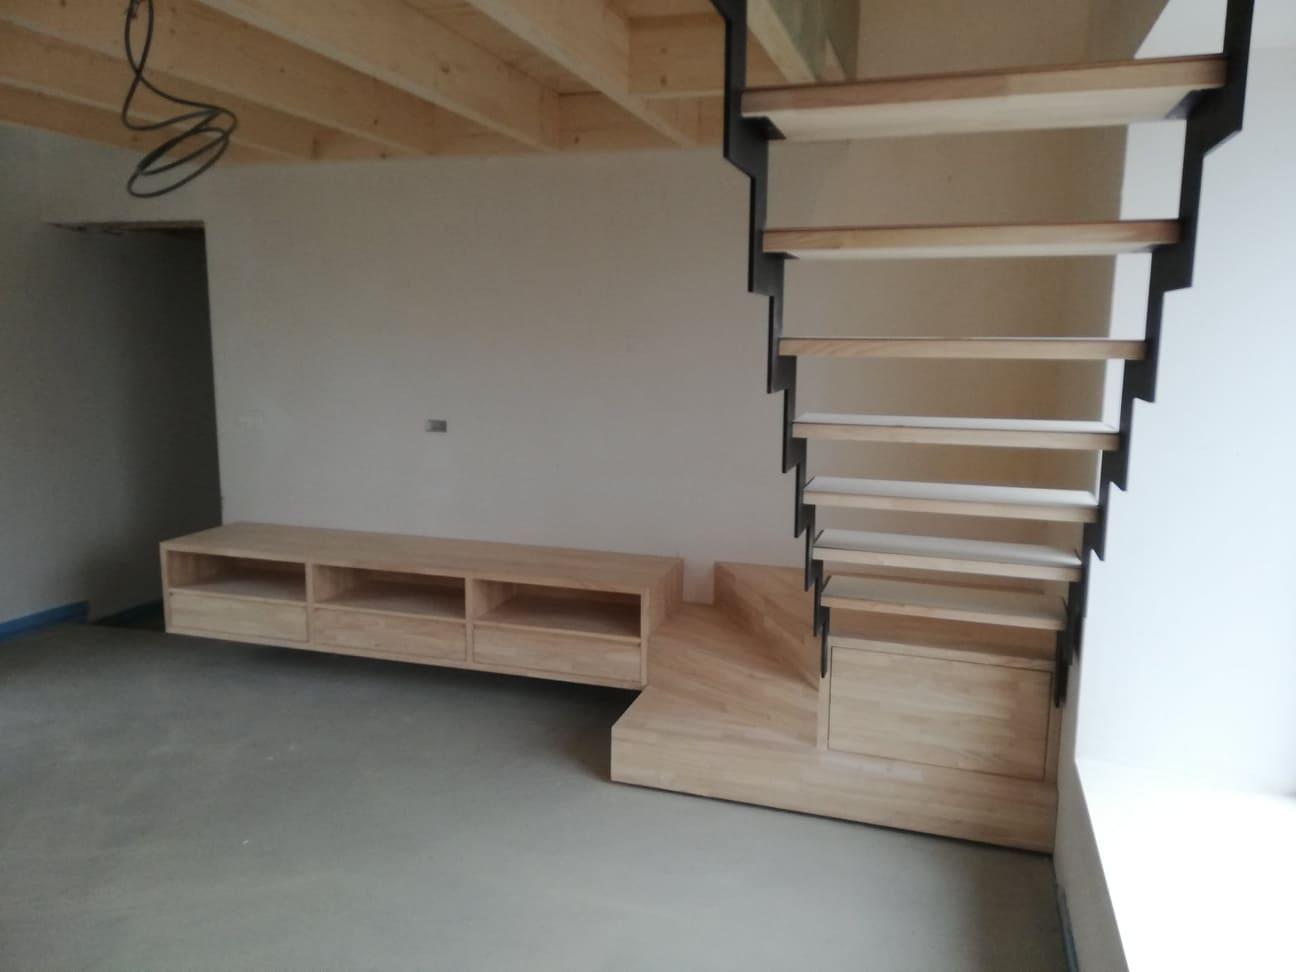 Escalier En Bois Avec Rangement tendance bois - menuiserie et mobilier bois | hamois